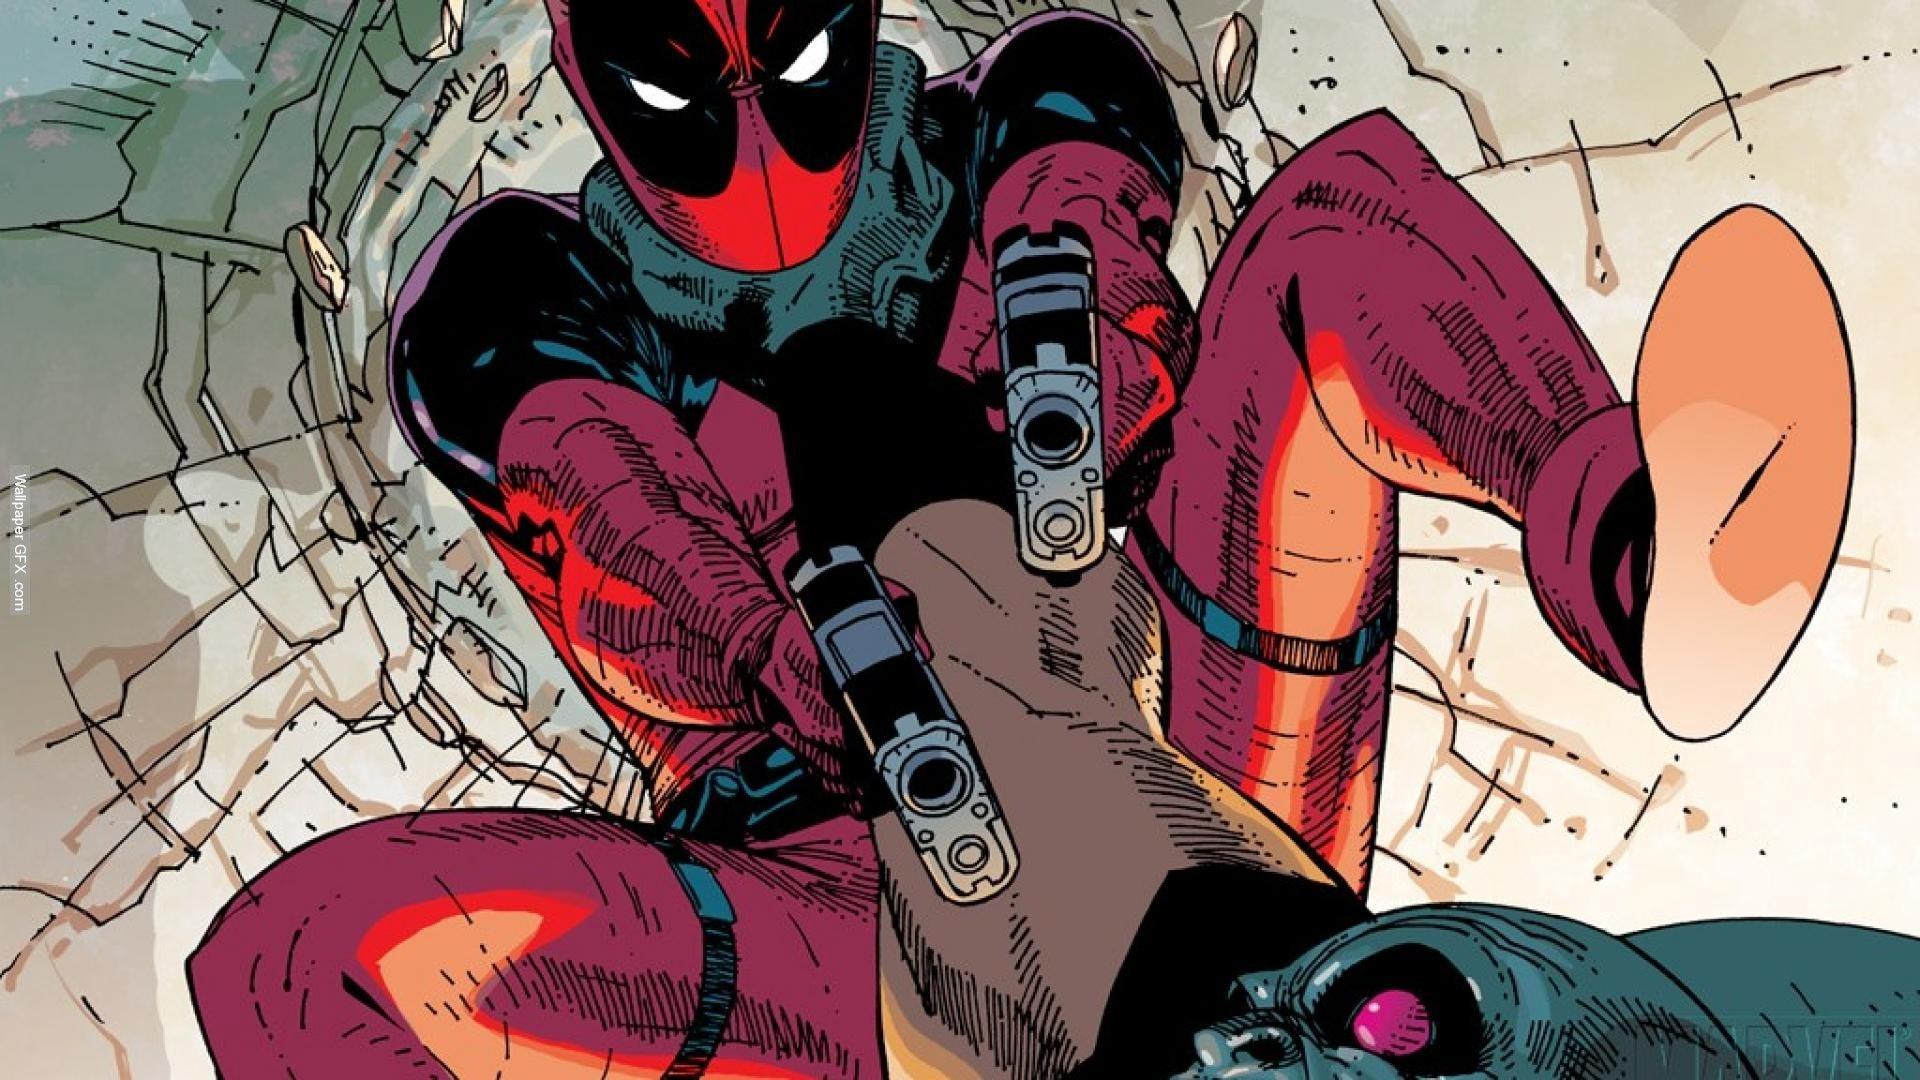 Deadpool Wade Winston Wilson Anti Hero Marvel Comics Mercenary Wallpaper Ultimate Alliance HD